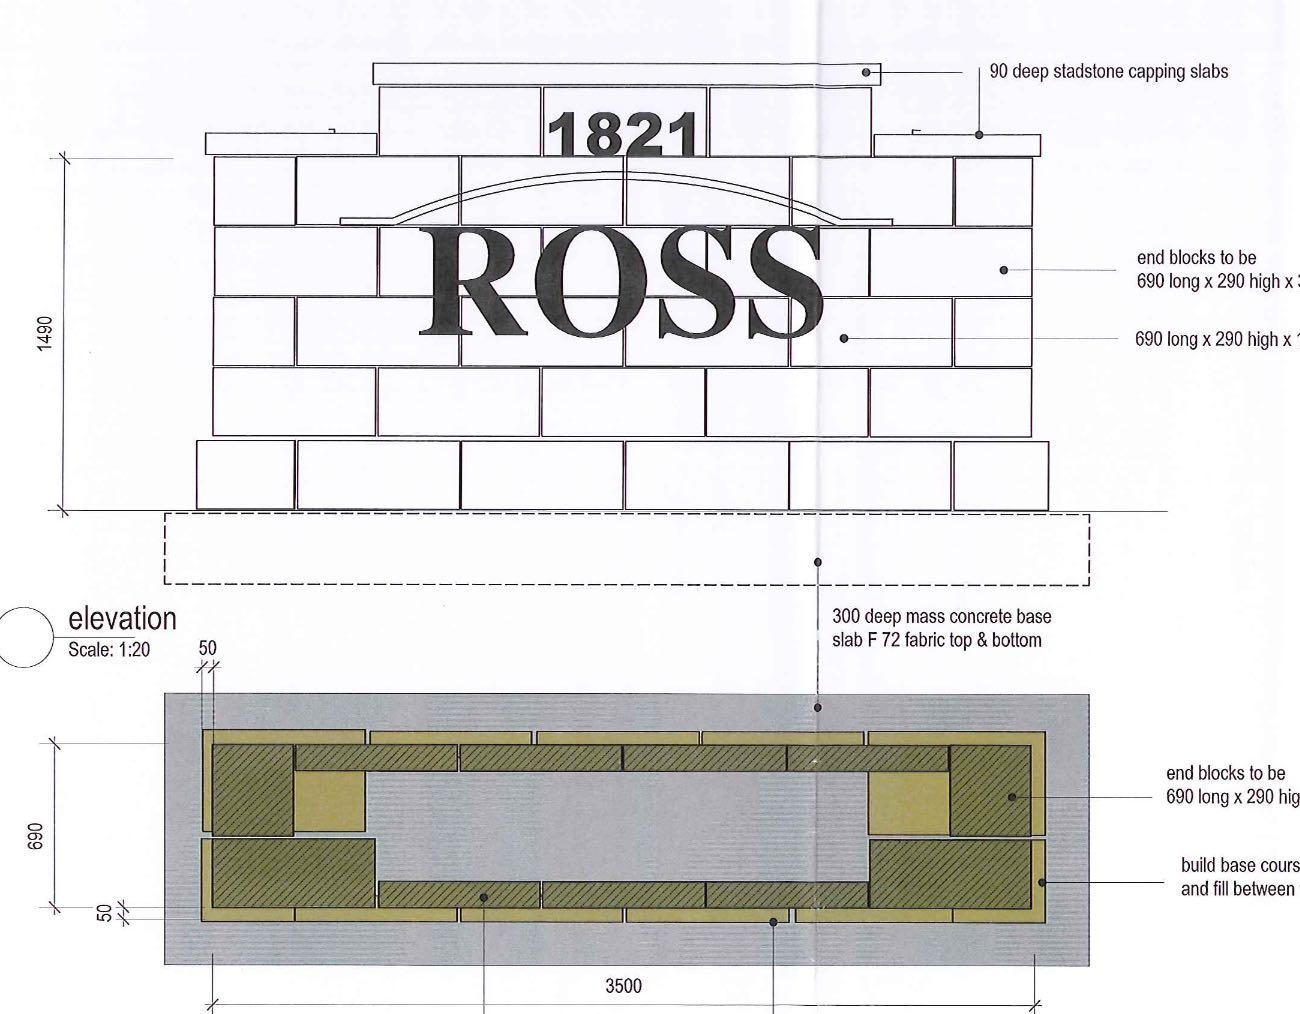 ROSS-EntranceSign-14Jun2016.jpg